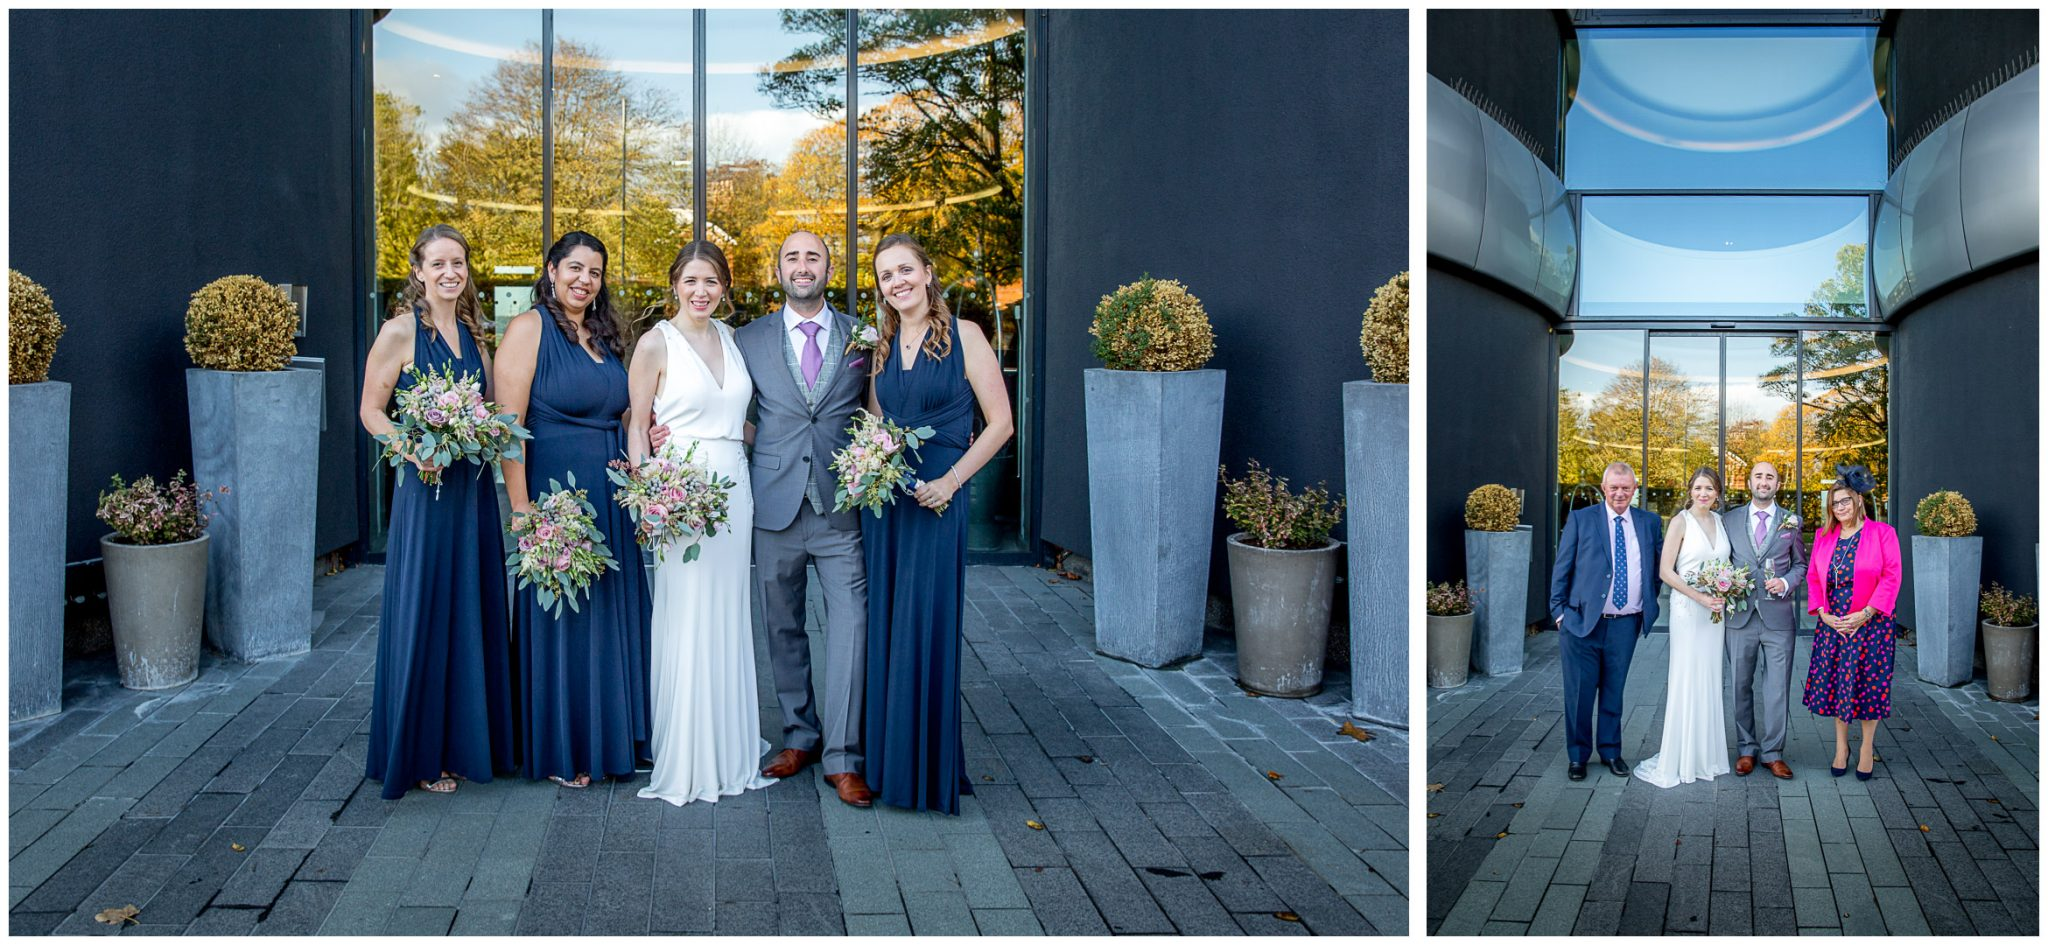 Group photographs outside main entrance of Aviator Hotel wedding